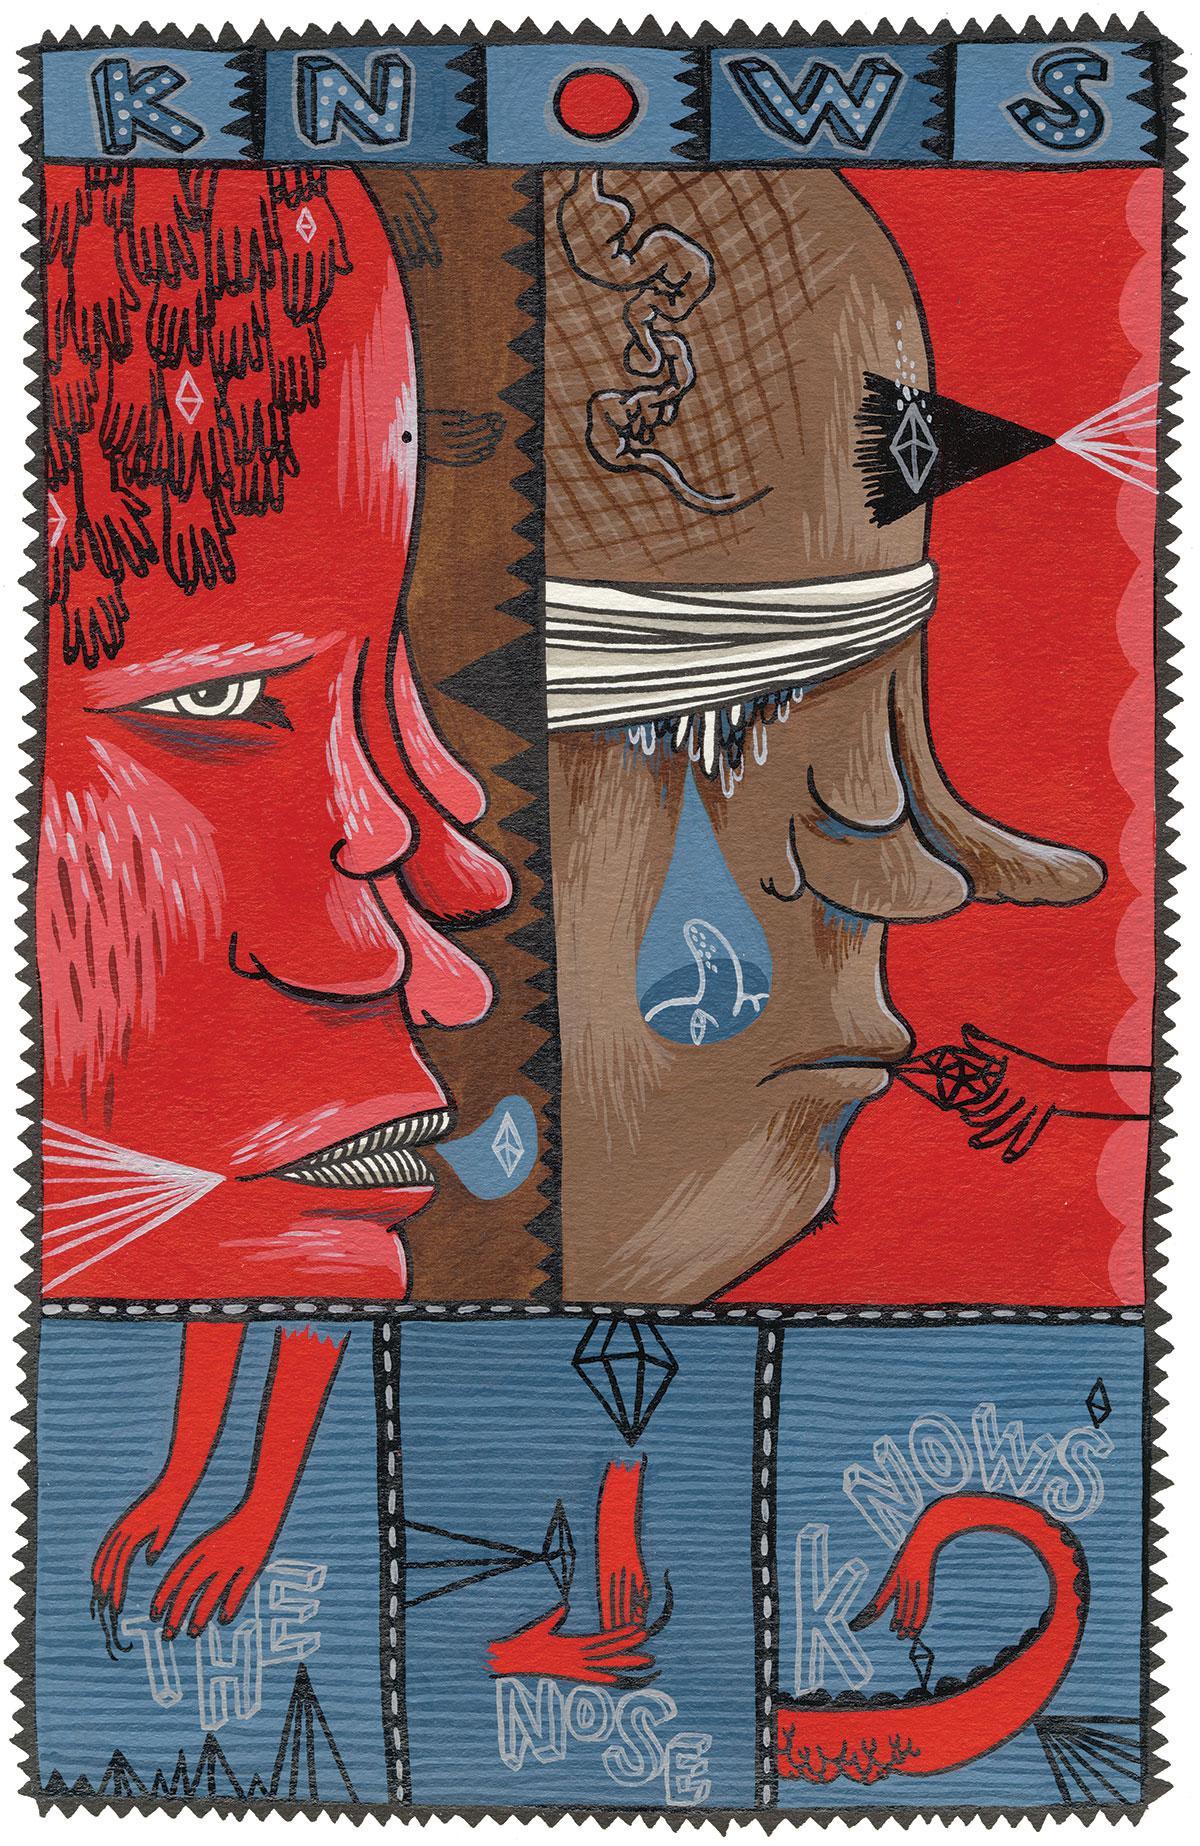 Art by Fiona Smyth